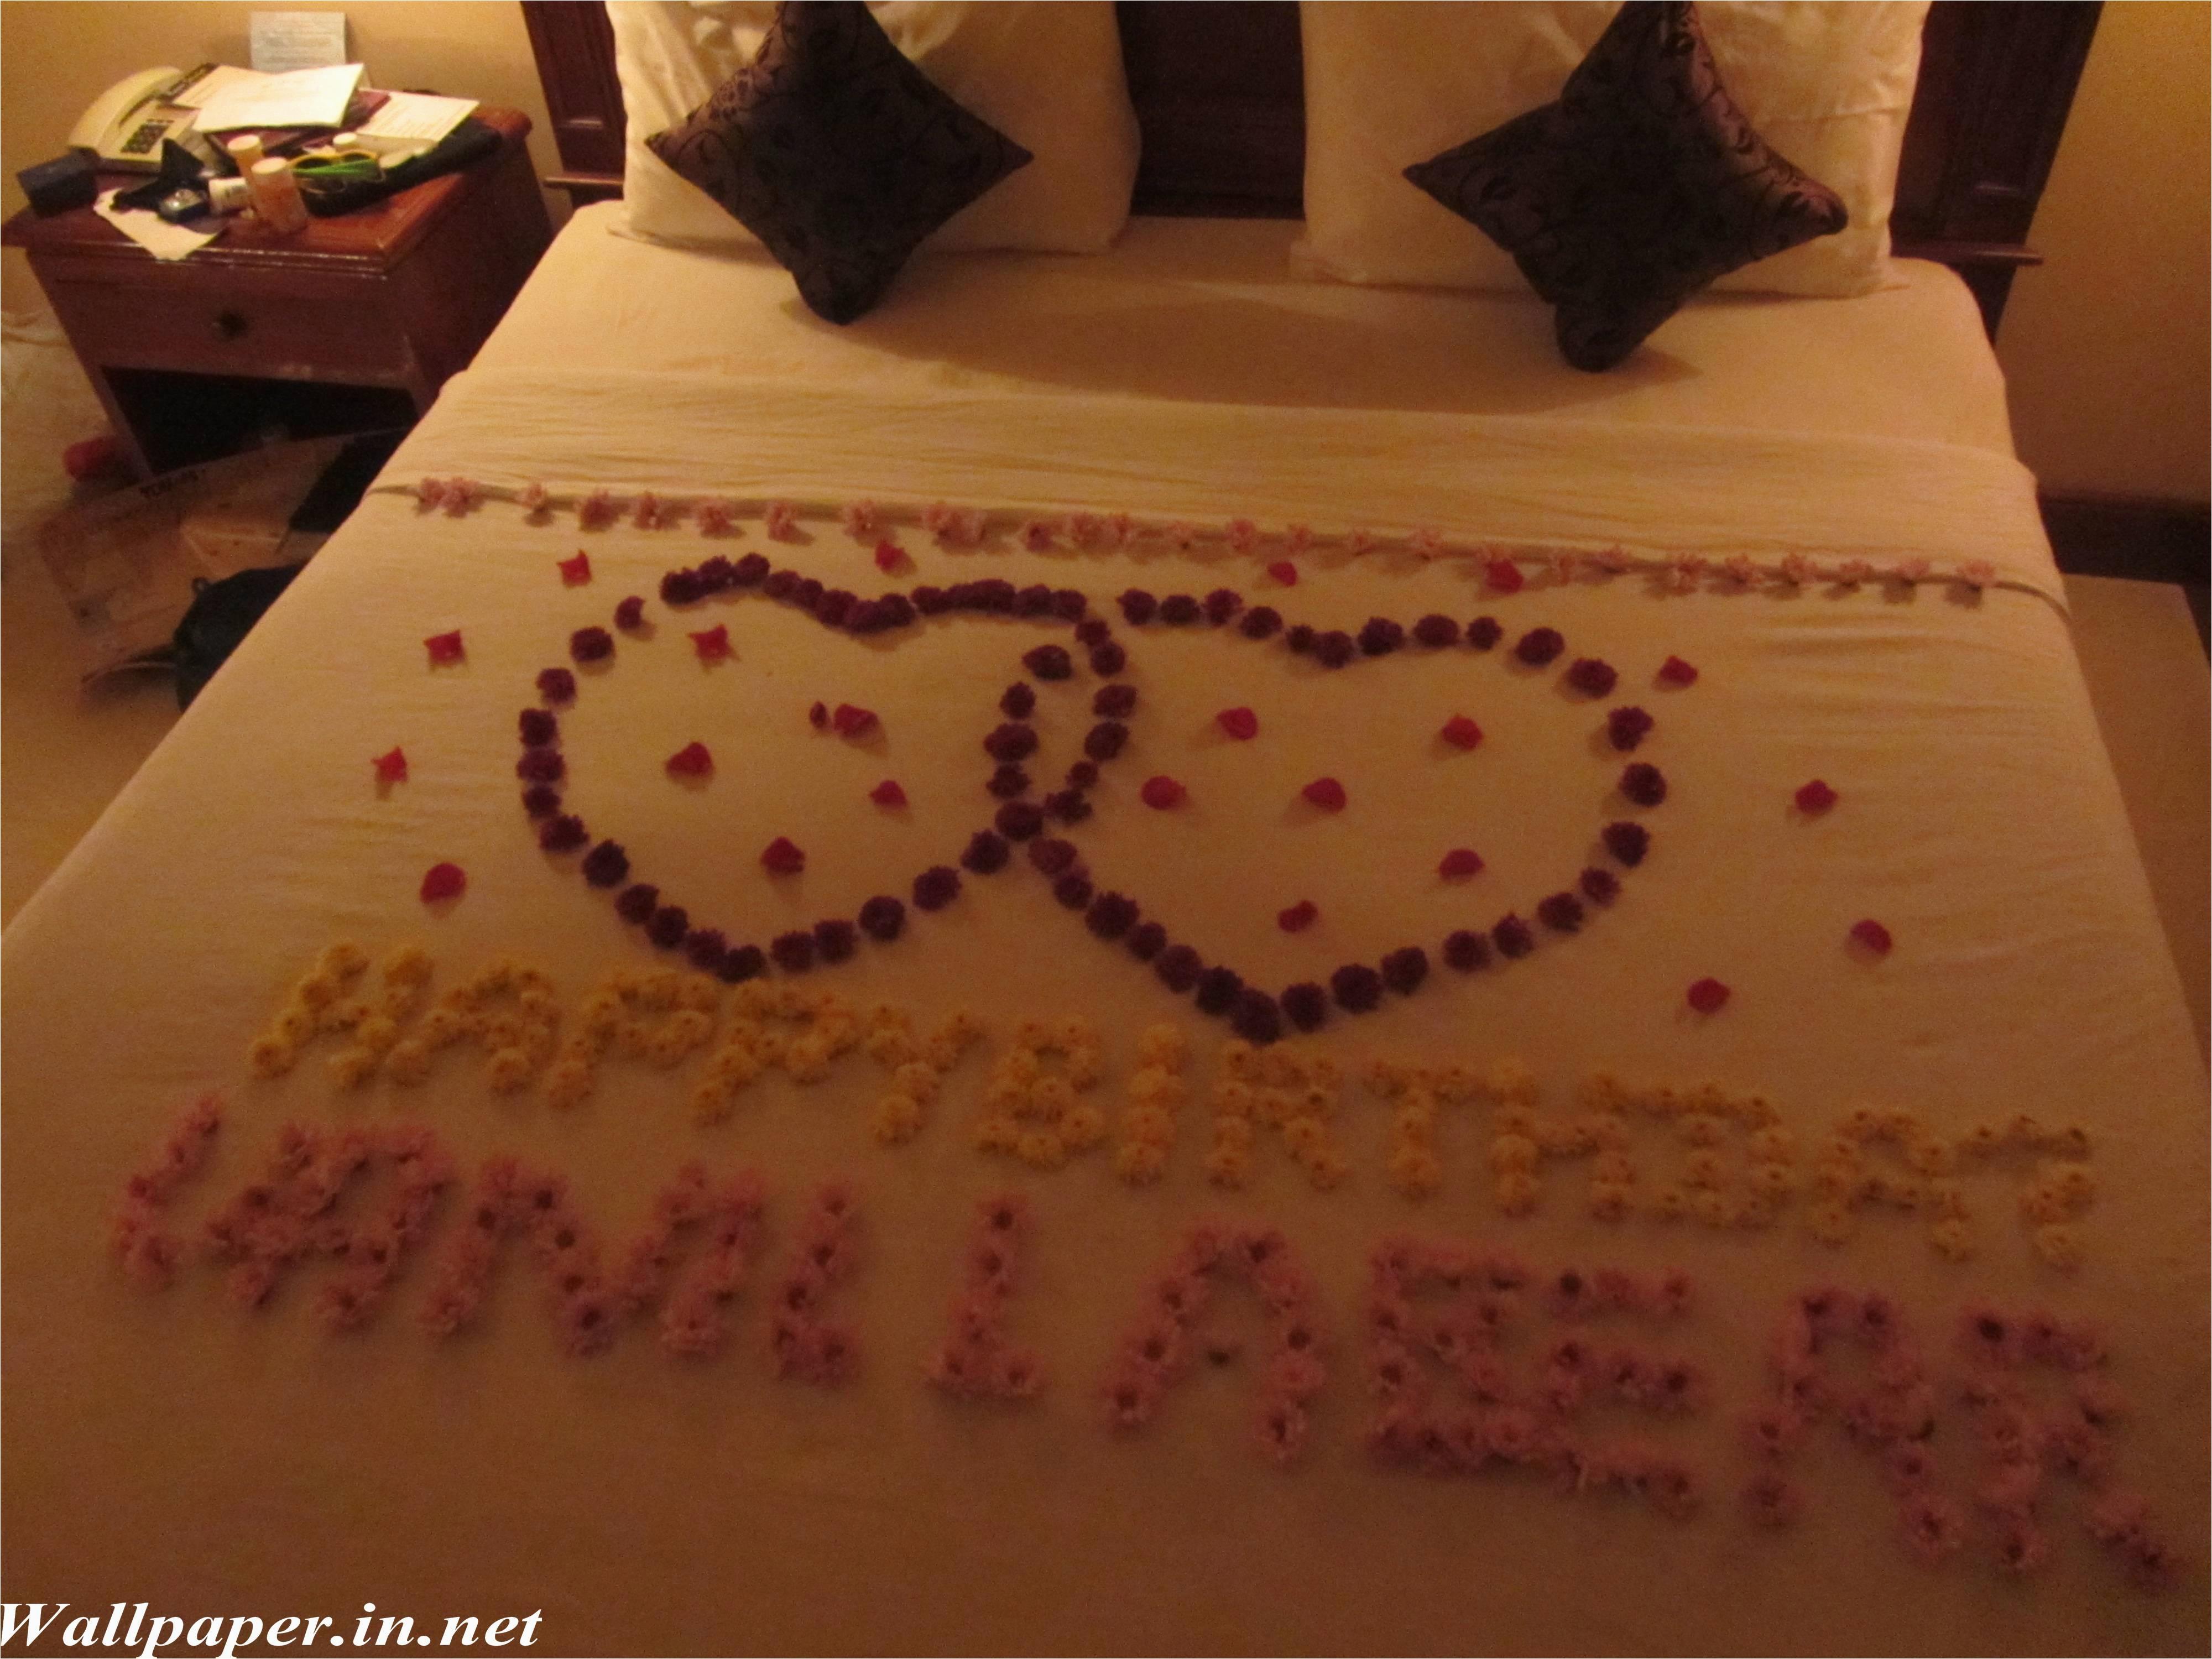 Romantic Gift Ideas for Her Birthday Romantic Birthday Gift Ideas Her Creative Gift Ideas